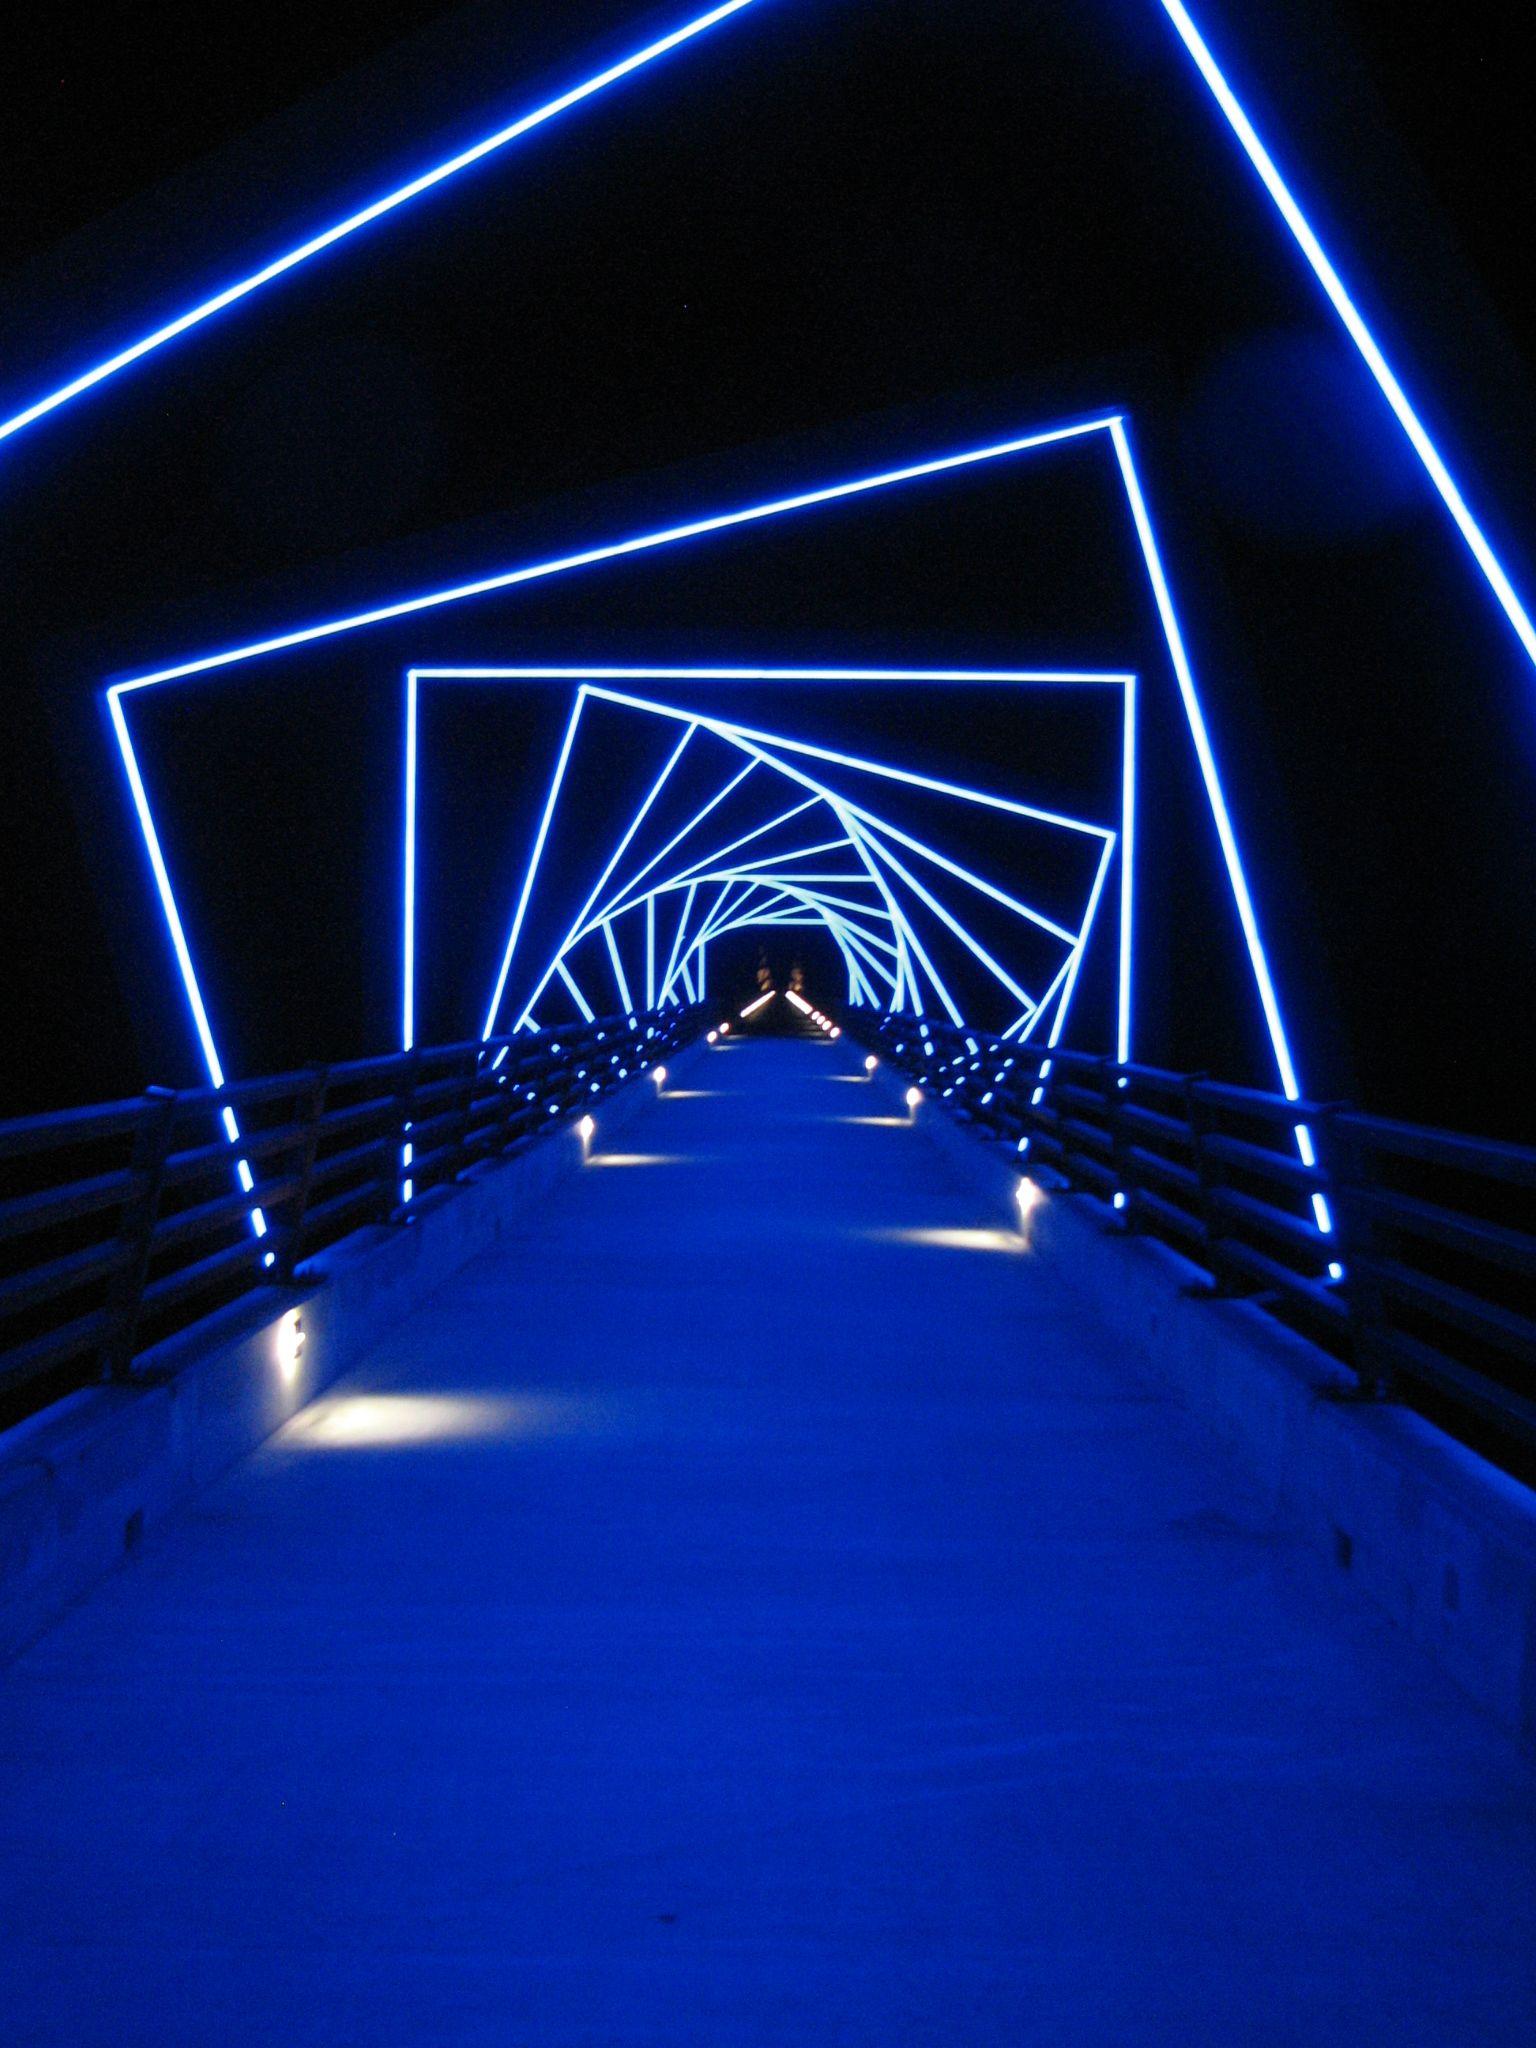 Tunnel Of Neon Lights Neon Lighting Neon Aesthetic Light